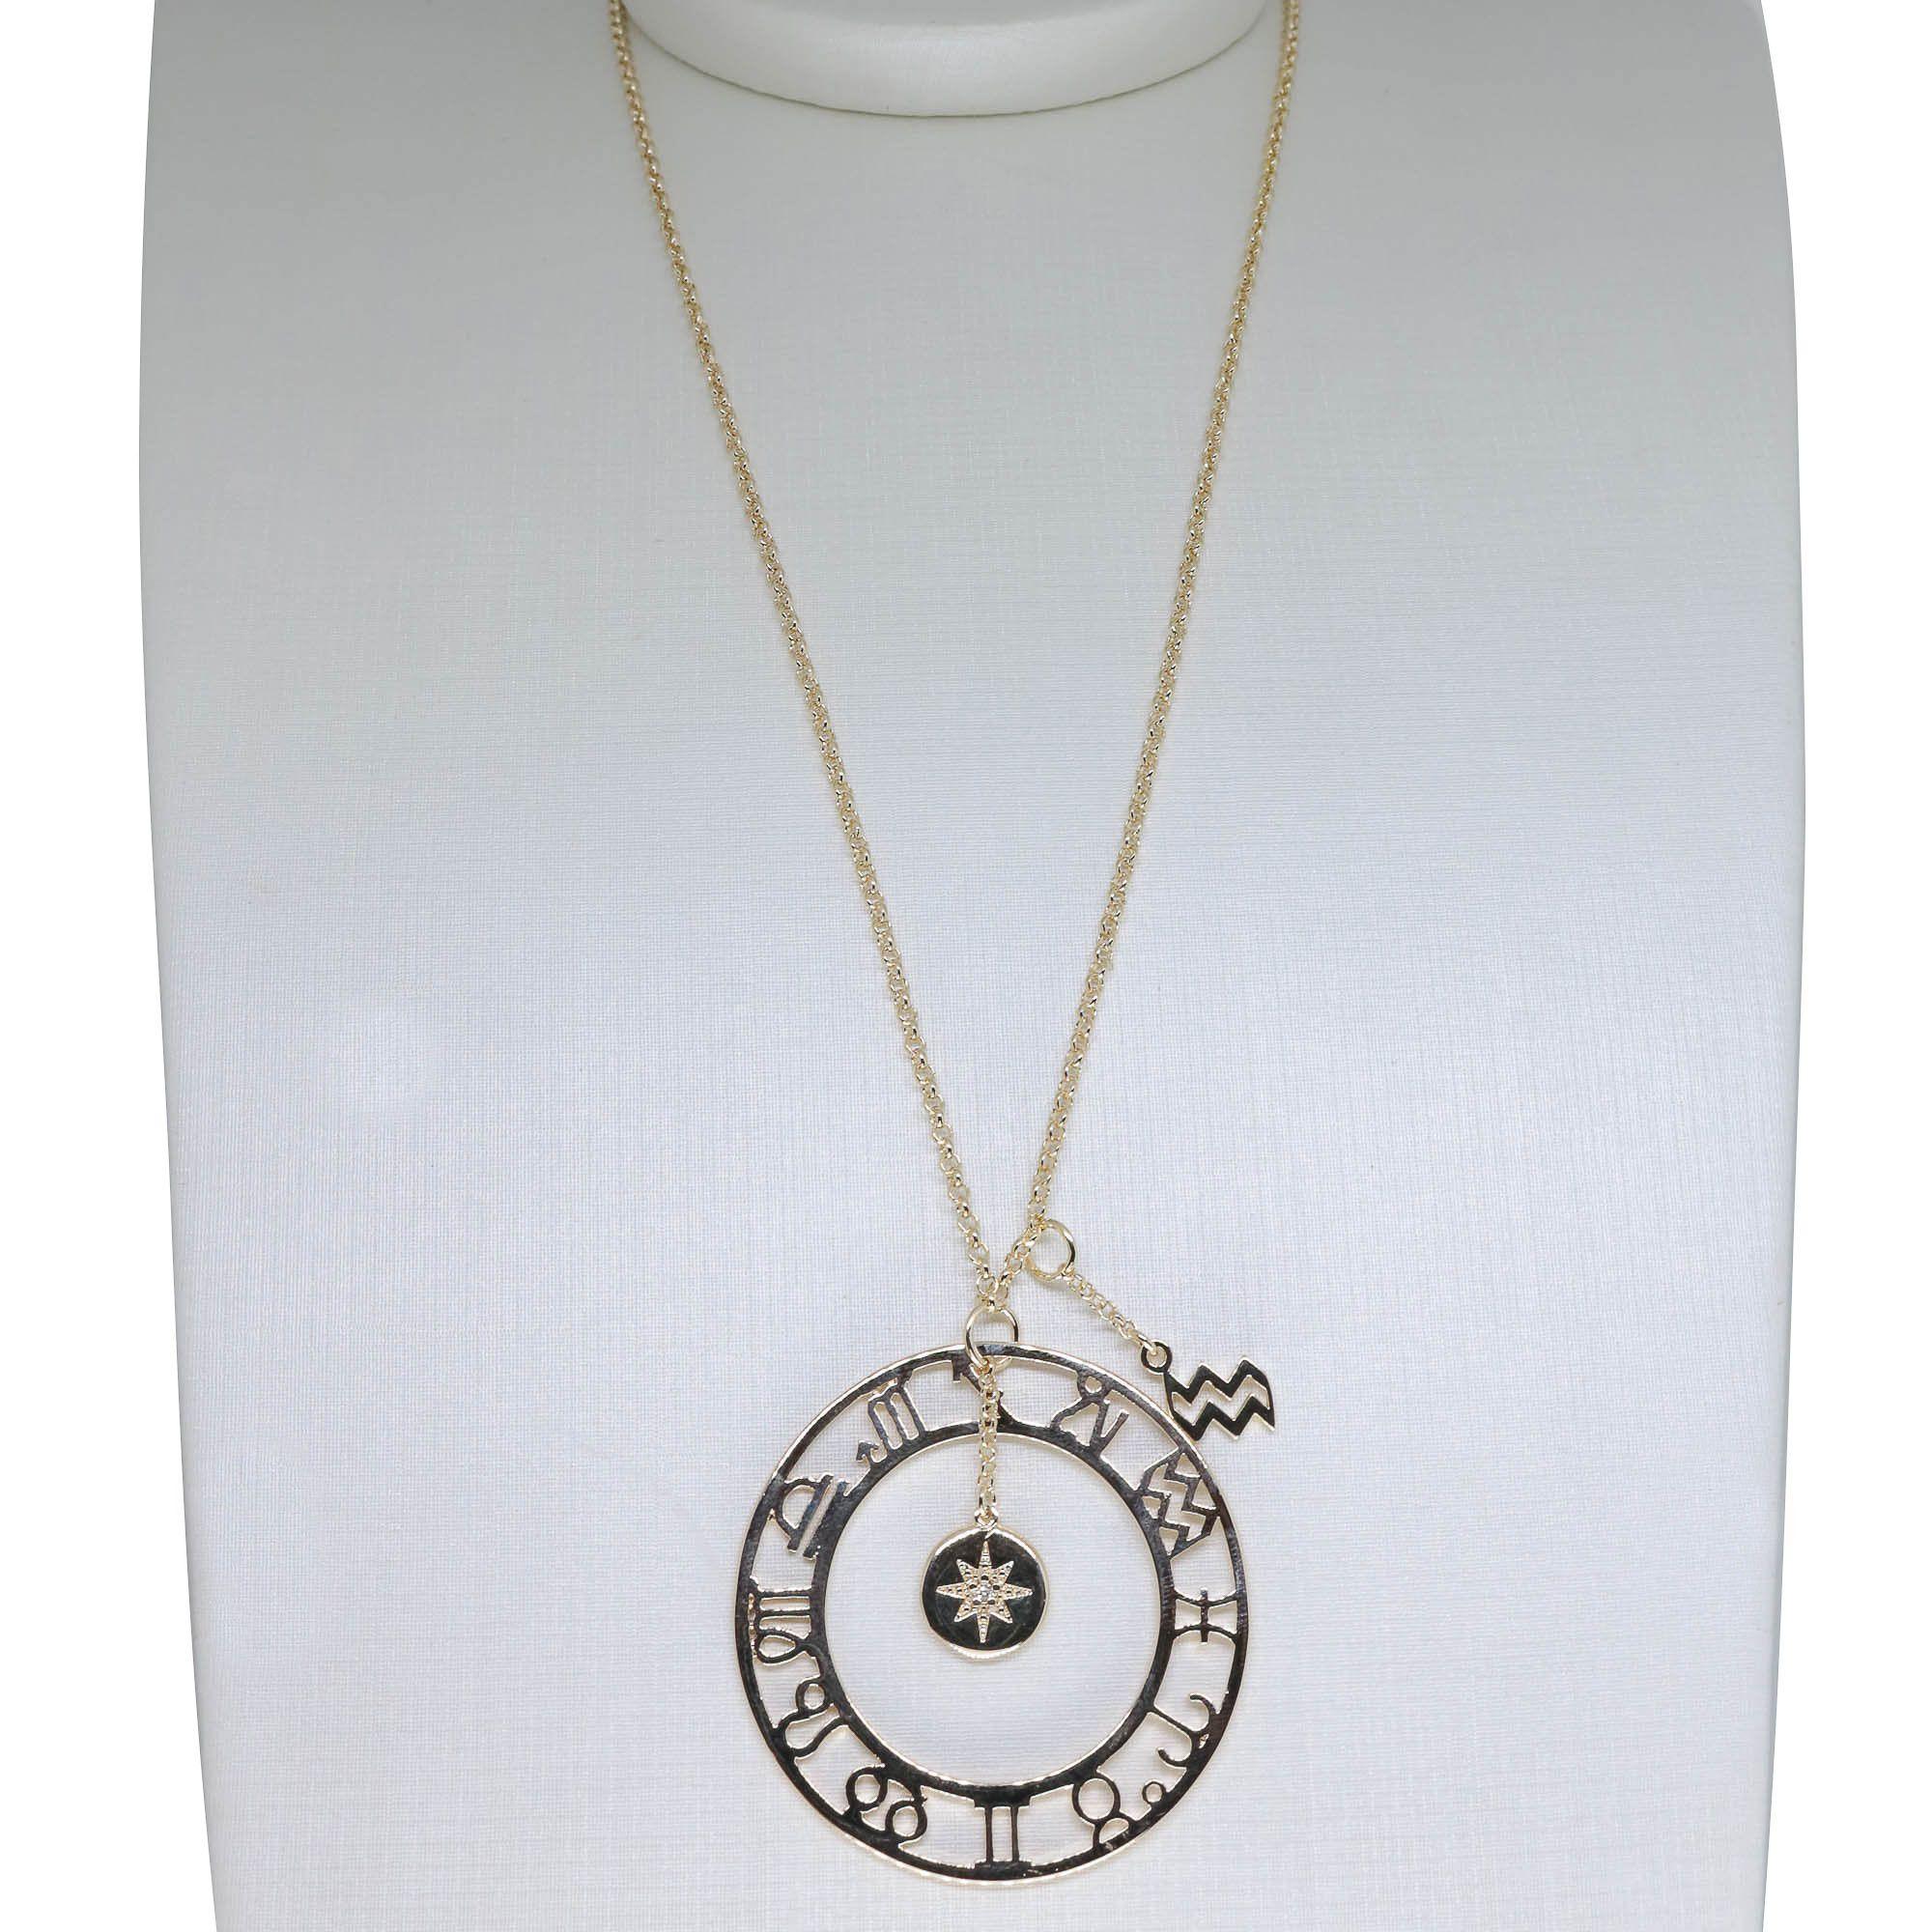 Colar Semi joia Mandala Signos banhado a ouro 18k ou rhodium